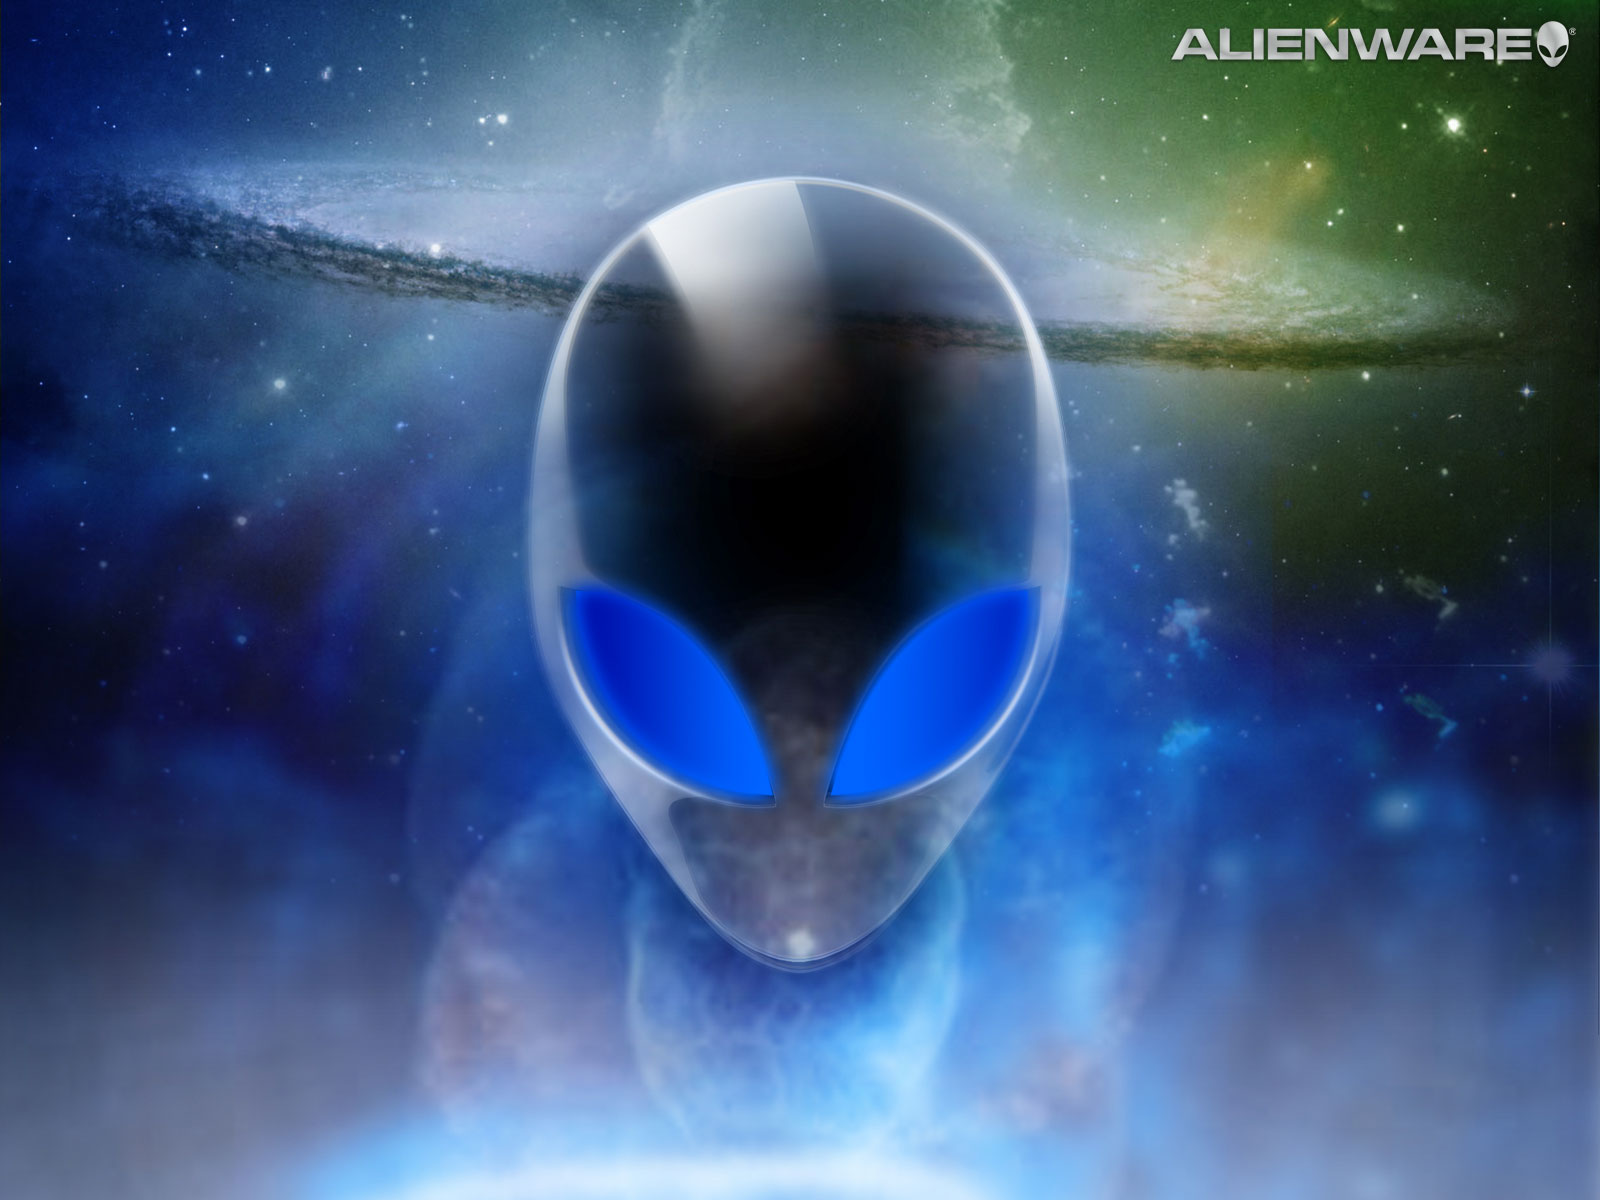 Technology Alienware 1600x1200